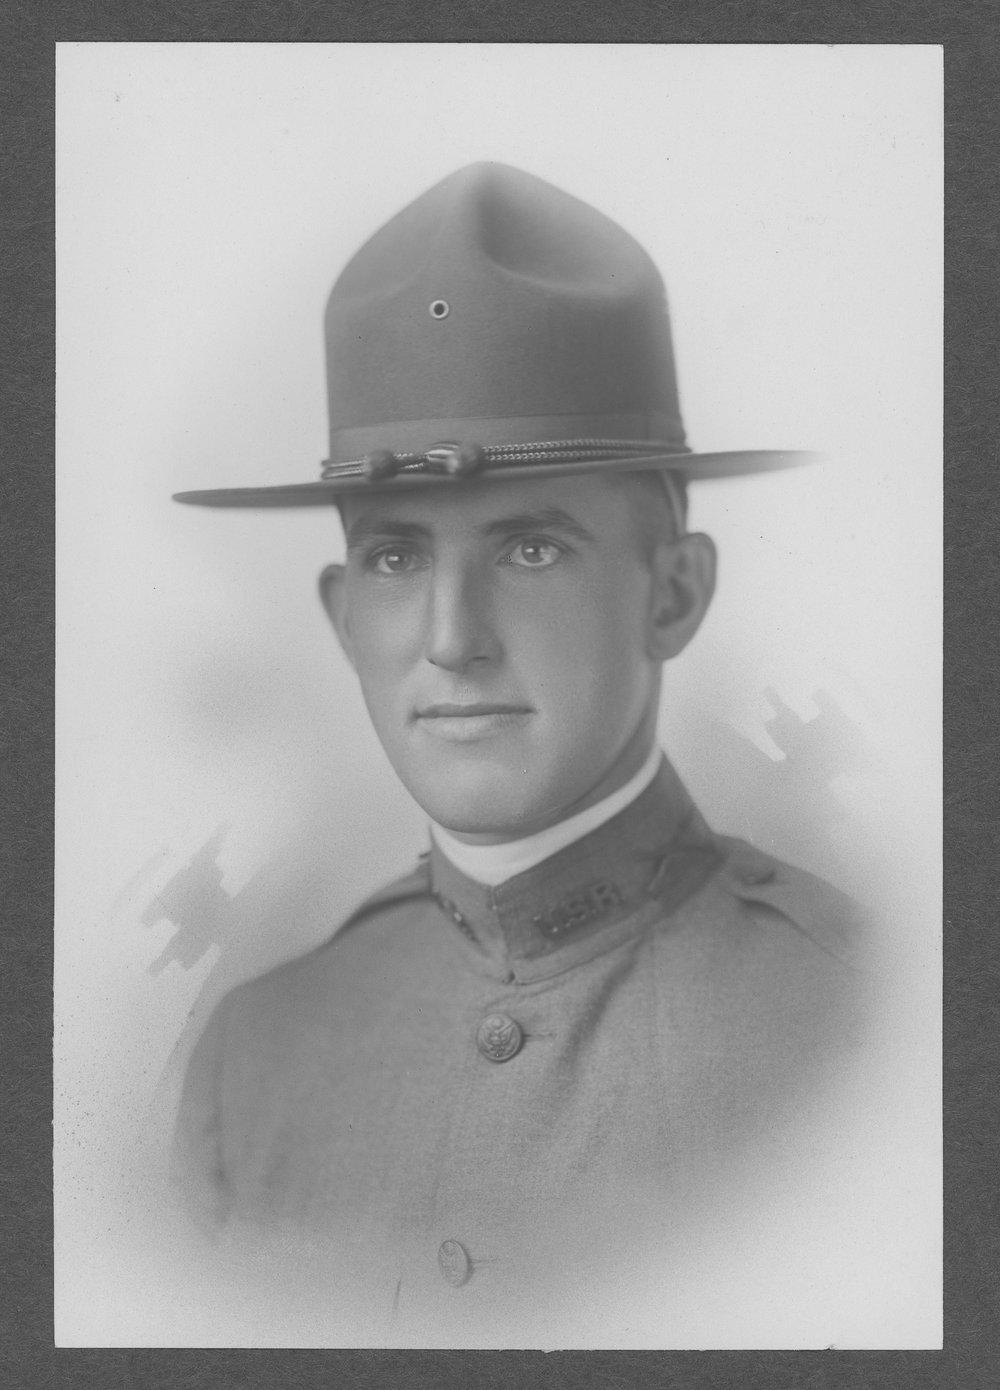 Harold W. Chance, World War I soldier - 1